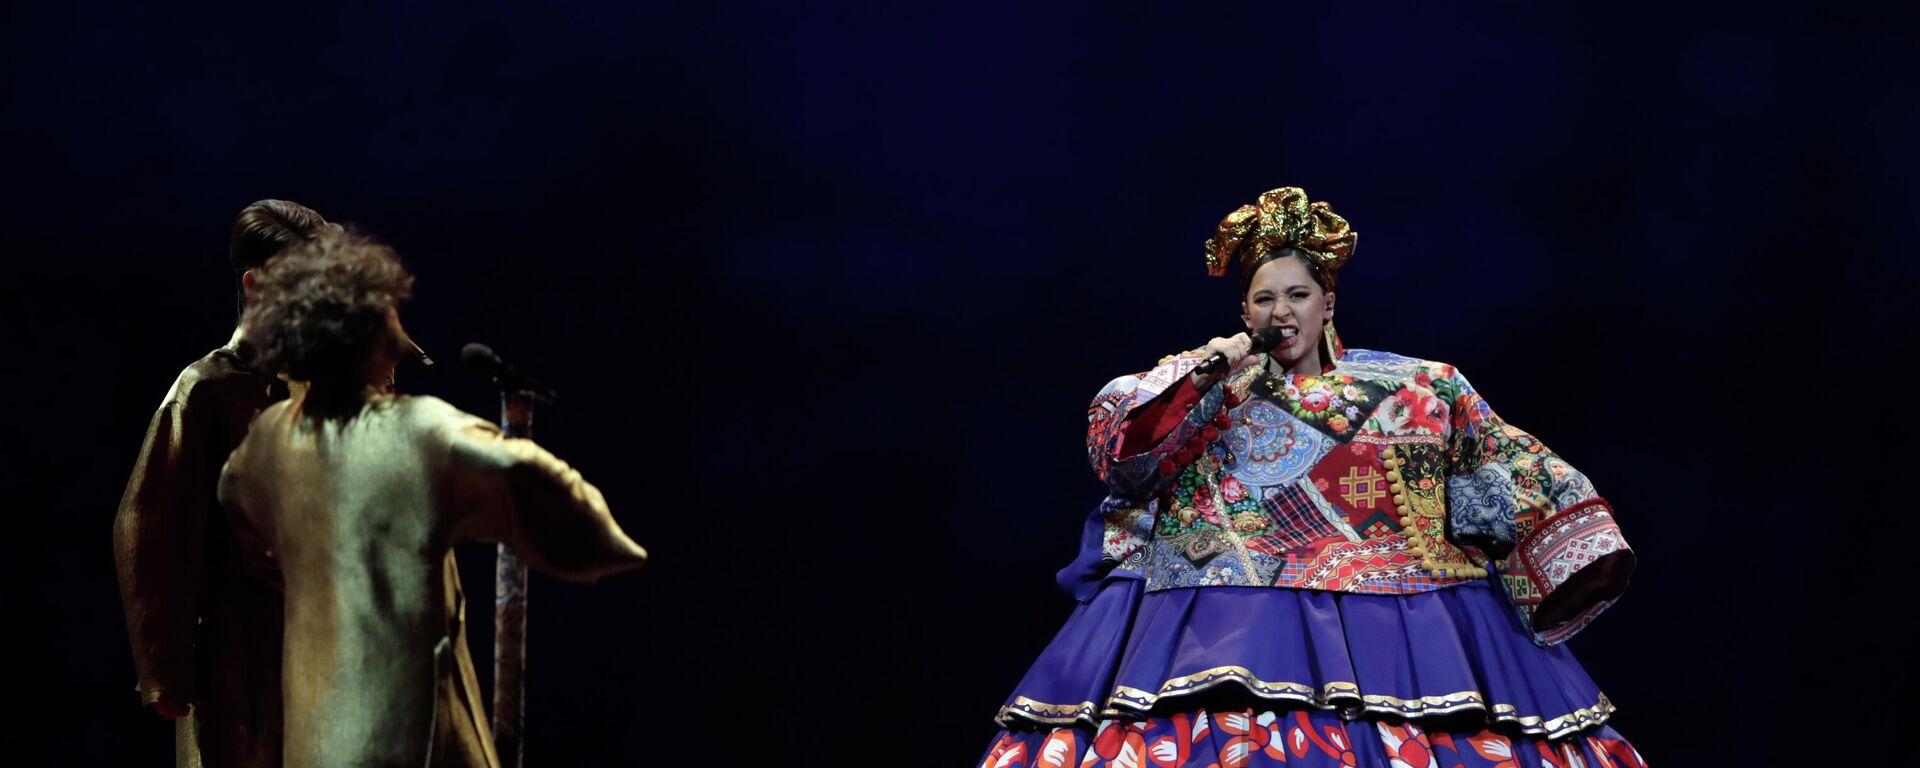 Манижа в финале Евровидения - Sputnik Таджикистан, 1920, 23.05.2021